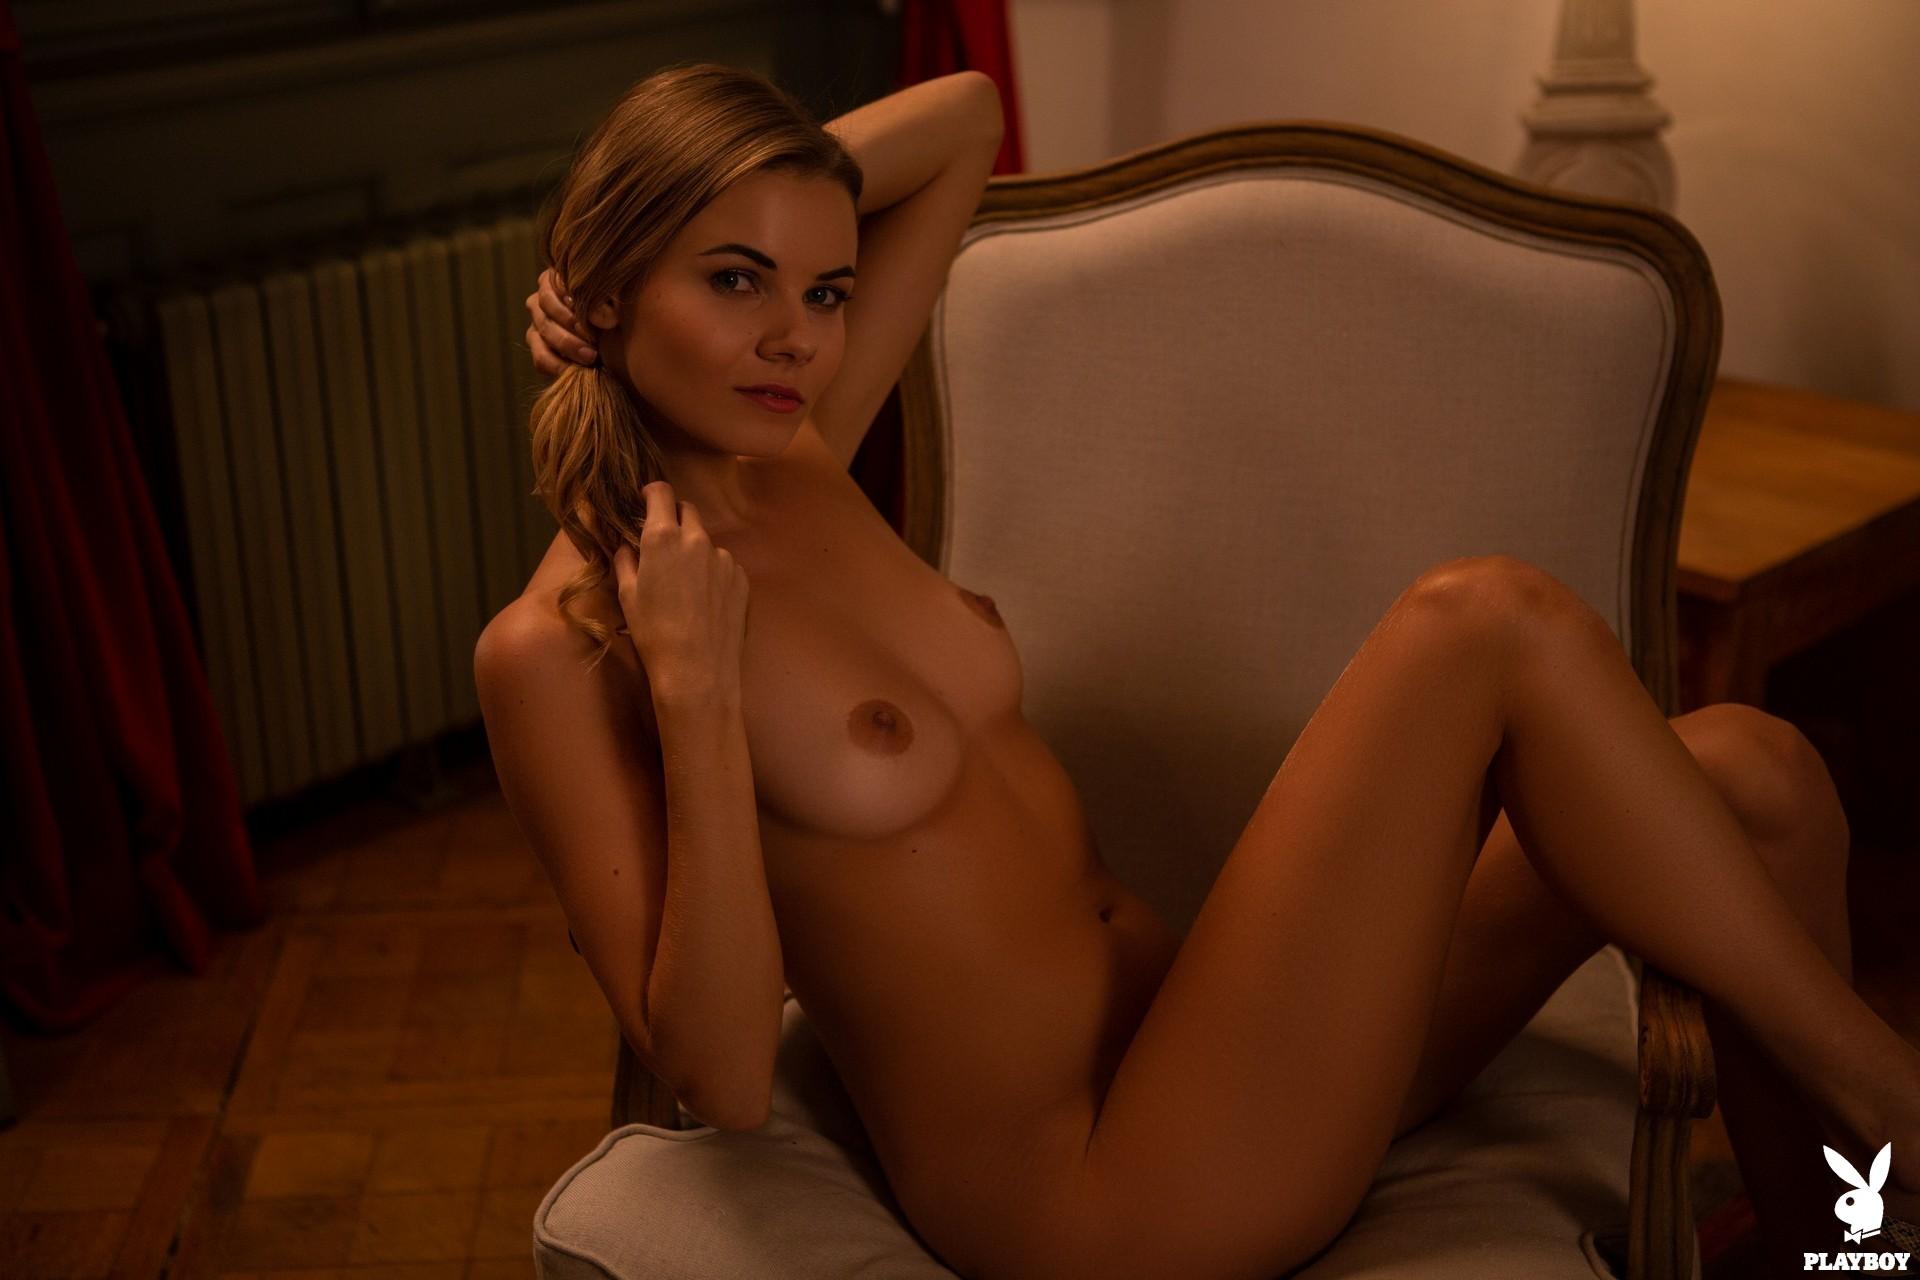 Kate Jones in Exquisite Allure - Playboy Plus 17